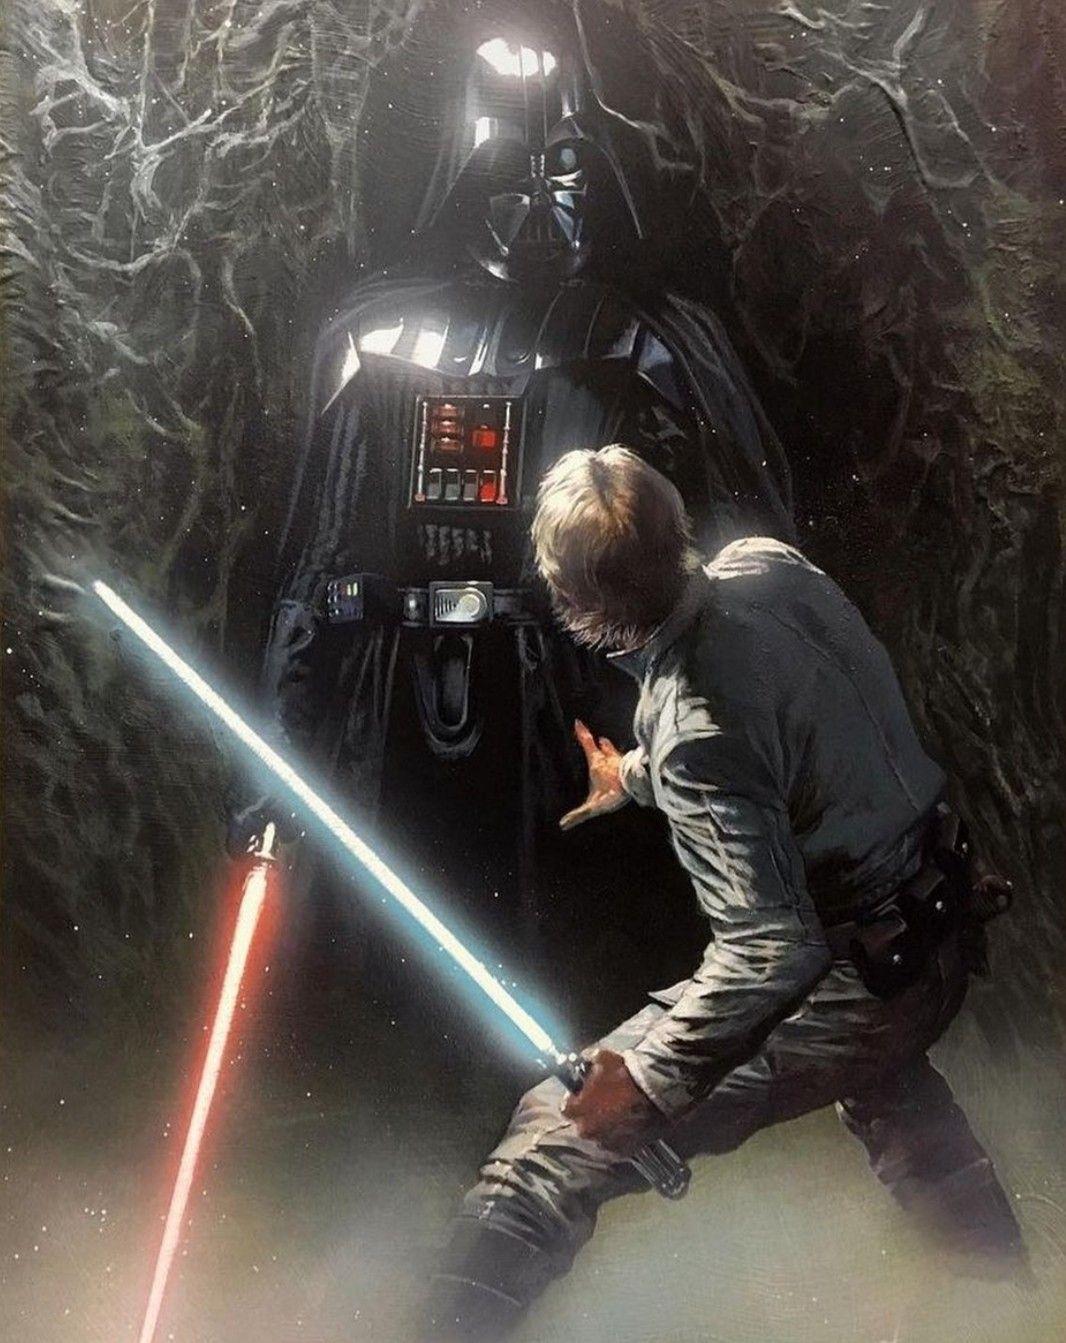 Luke Skywalker Vs Darth Vader In Degobah Darth Vader Vader Star Wars Star Wars Universe